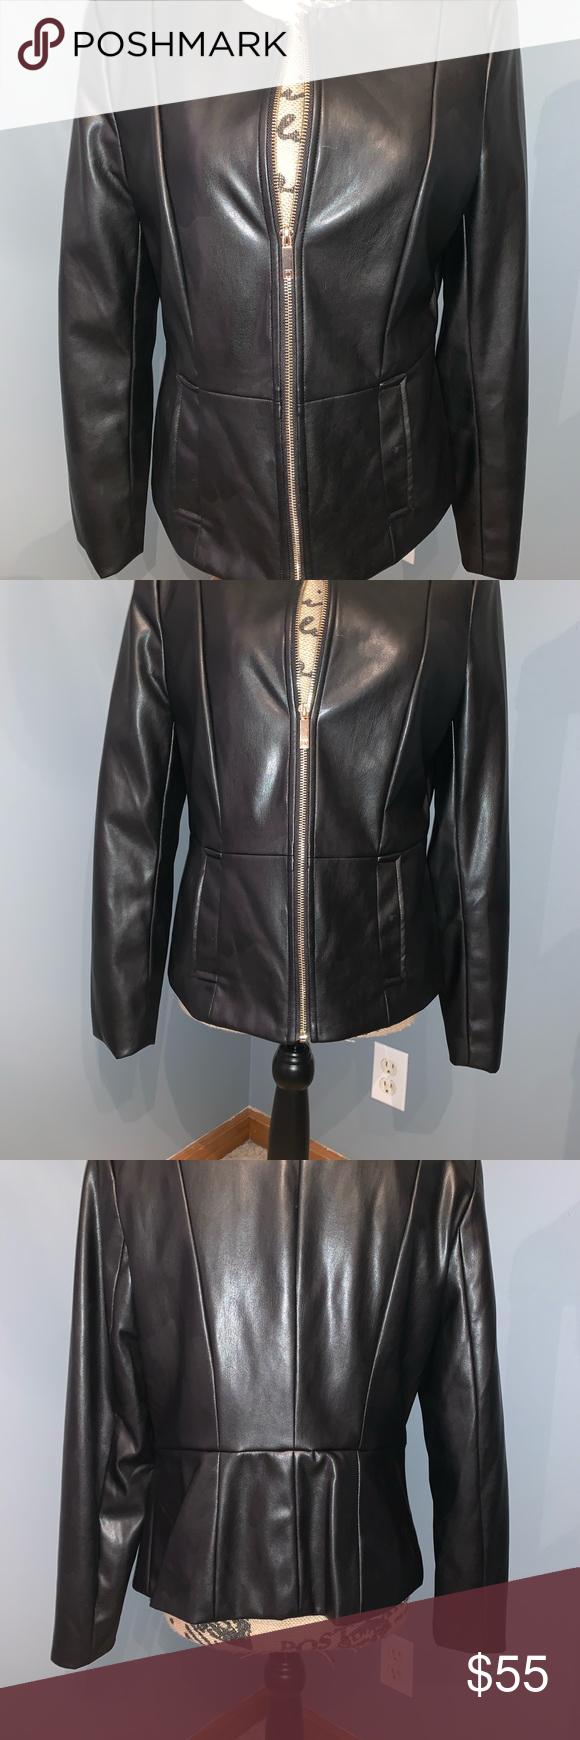 Liz Claiborne Career Black Jacket Sophisticated Black Faux Leather Jacket Gold Tone Zipper Has Pockets Euc Black Faux Leather Jacket Fashion Clothes Design